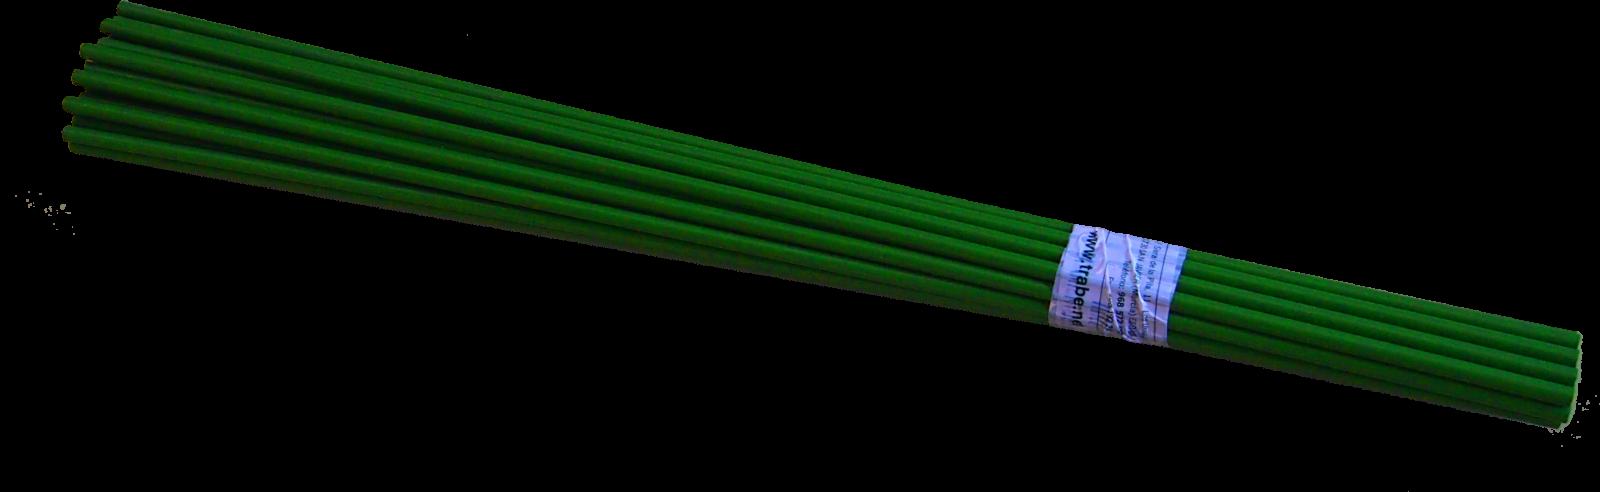 Tutor De Plantas 120cm